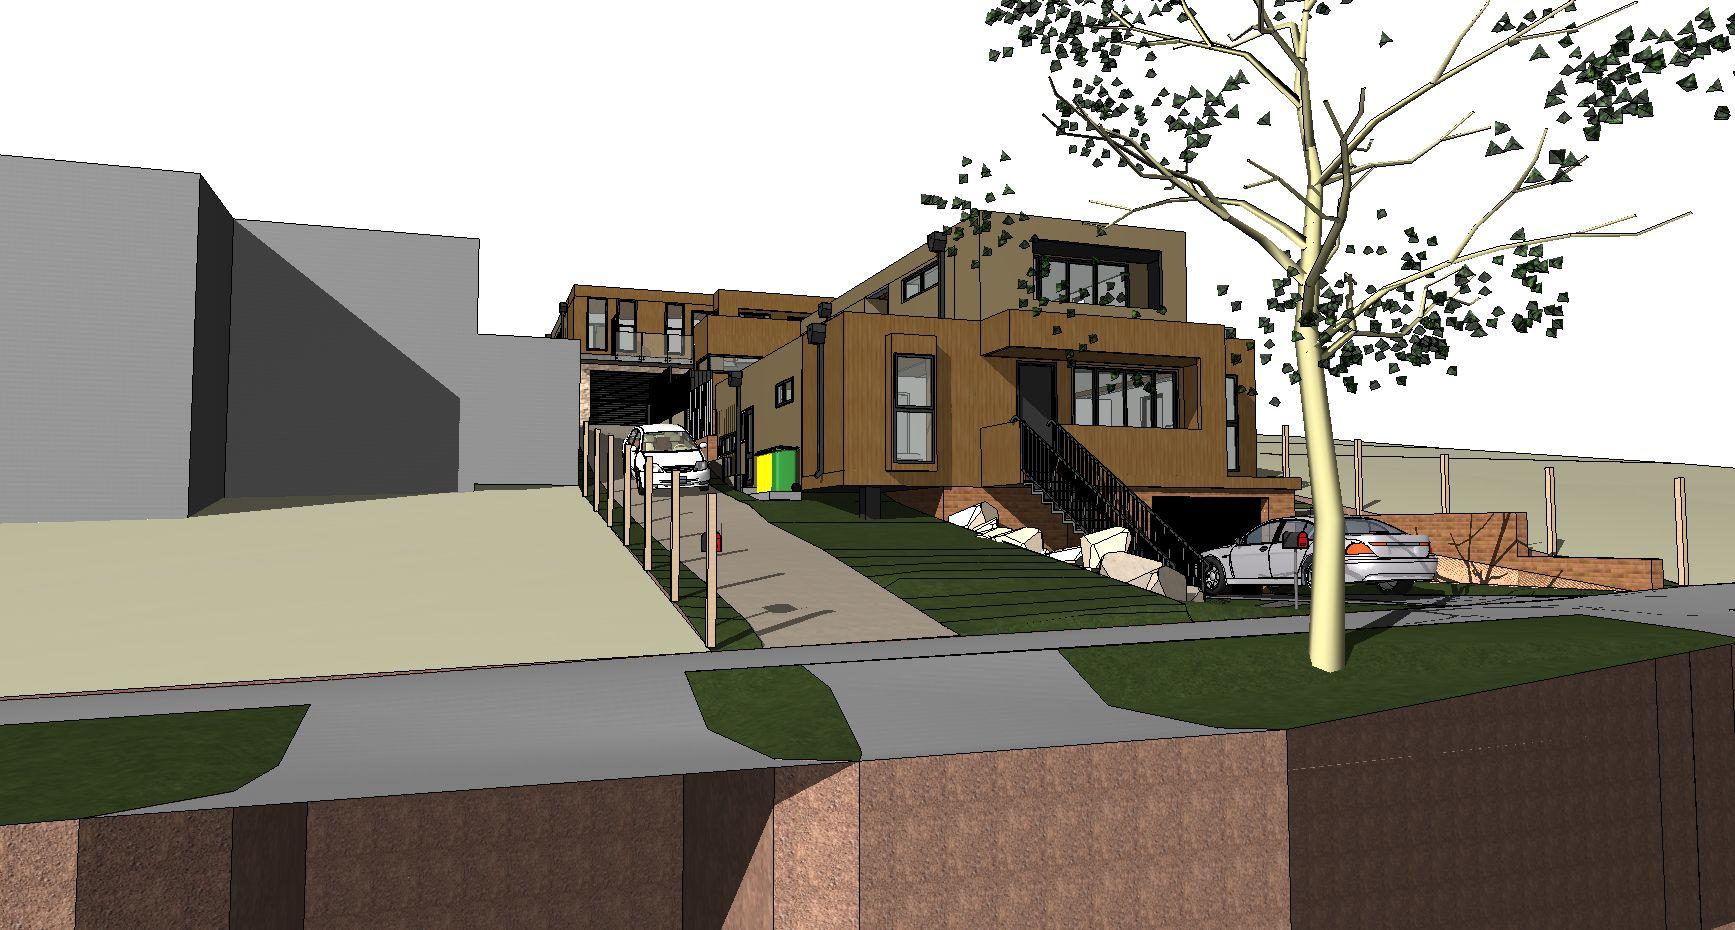 Lot 1/16 Newsom Street, Ascot Vale VIC 3032, Image 2